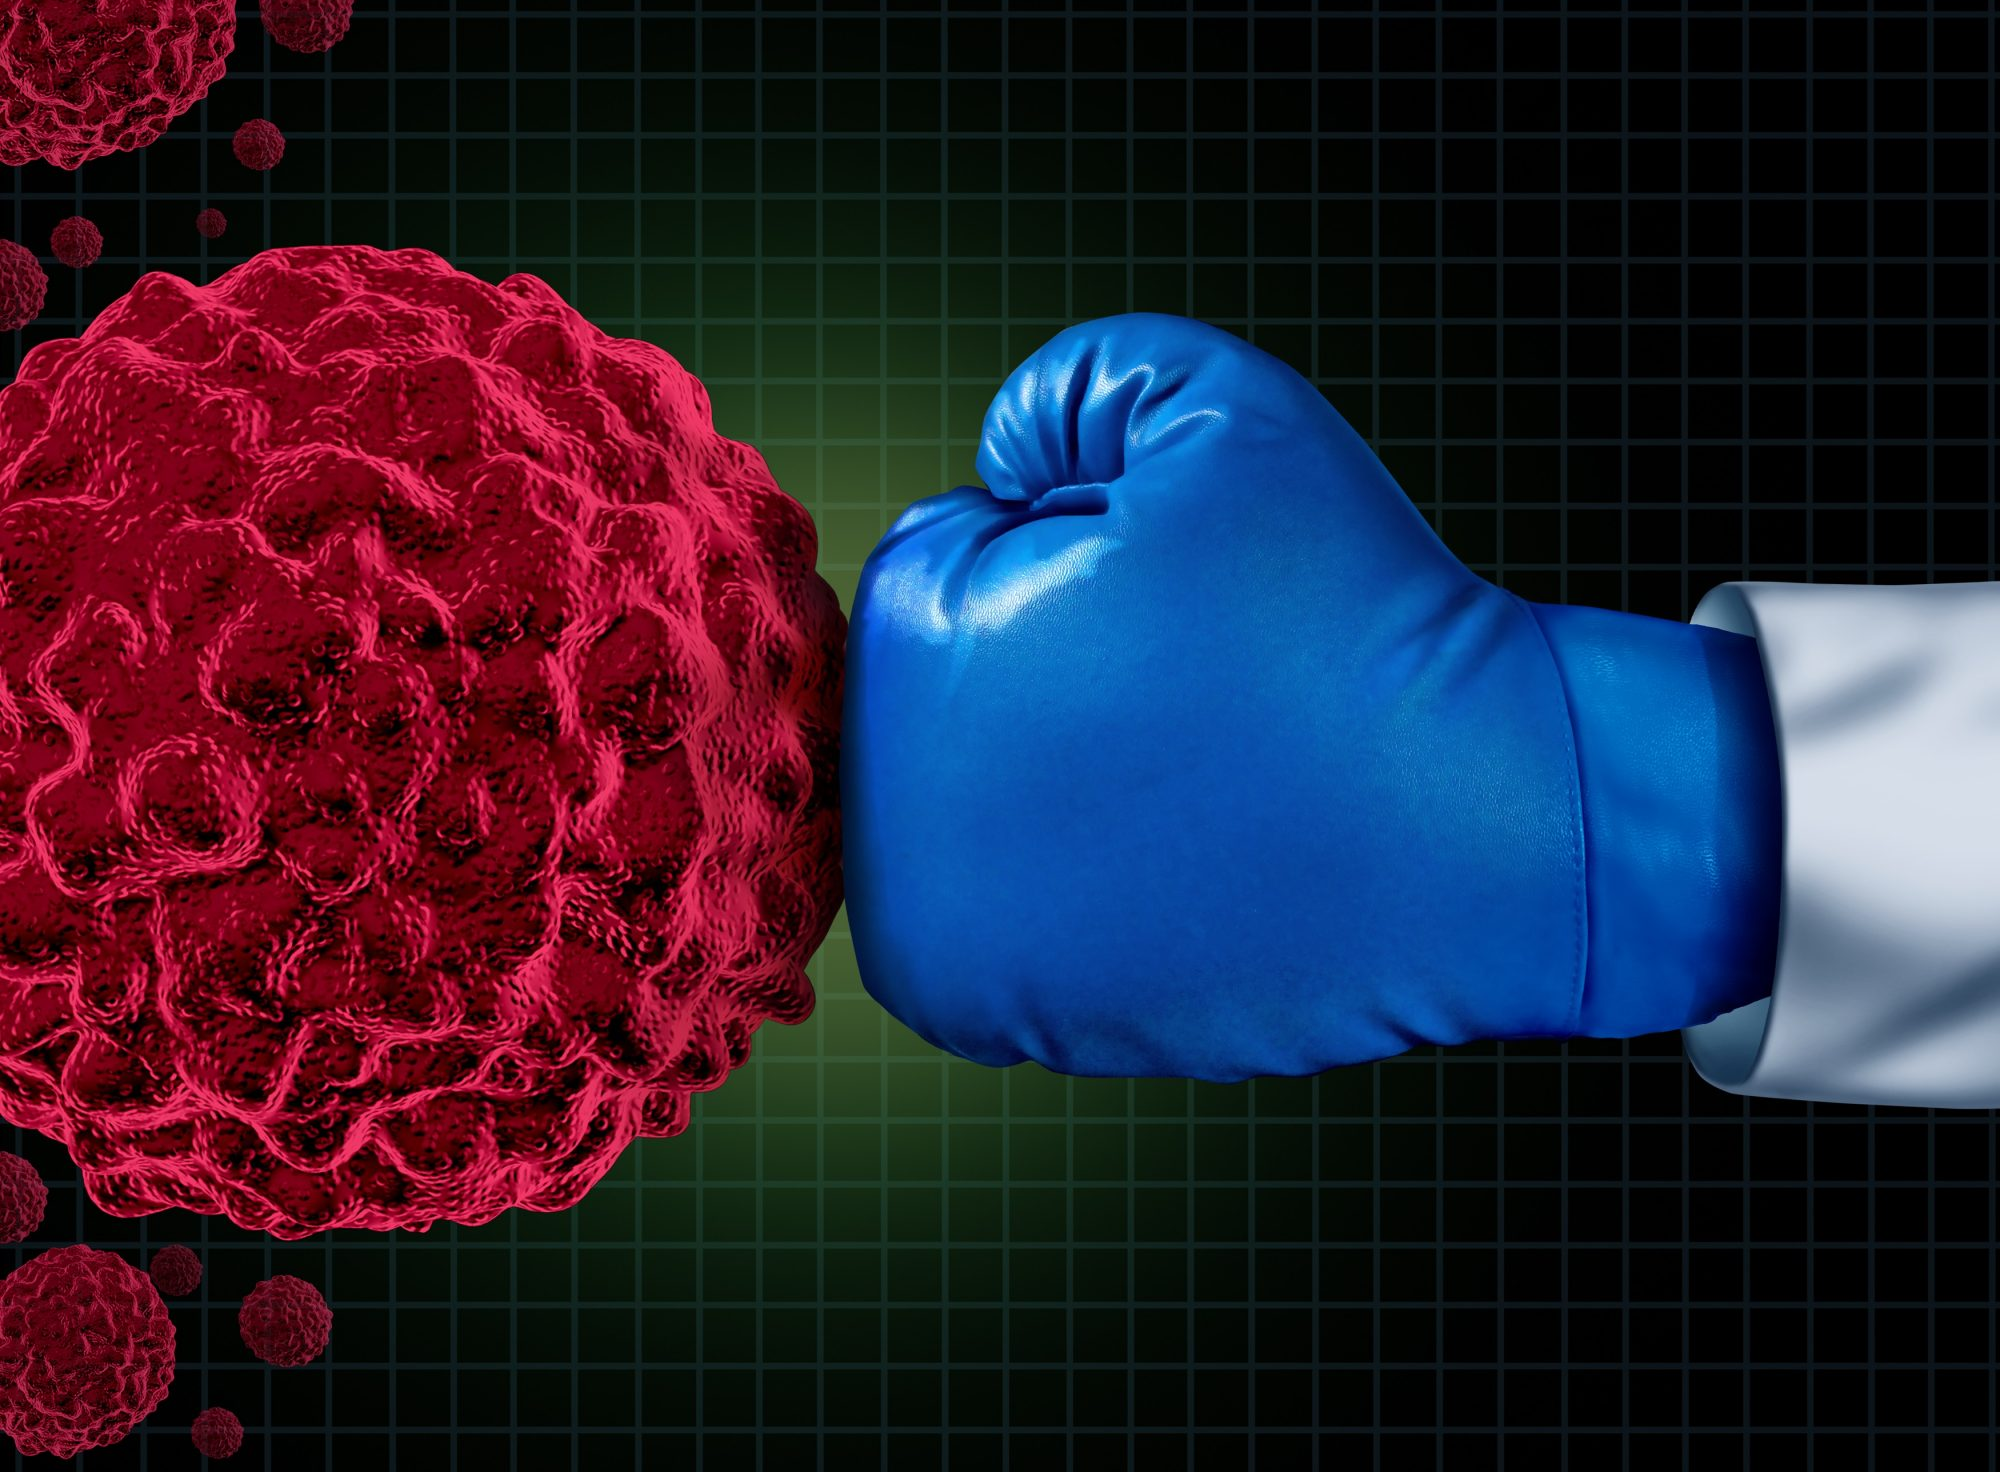 Лечение рака ласкин диета